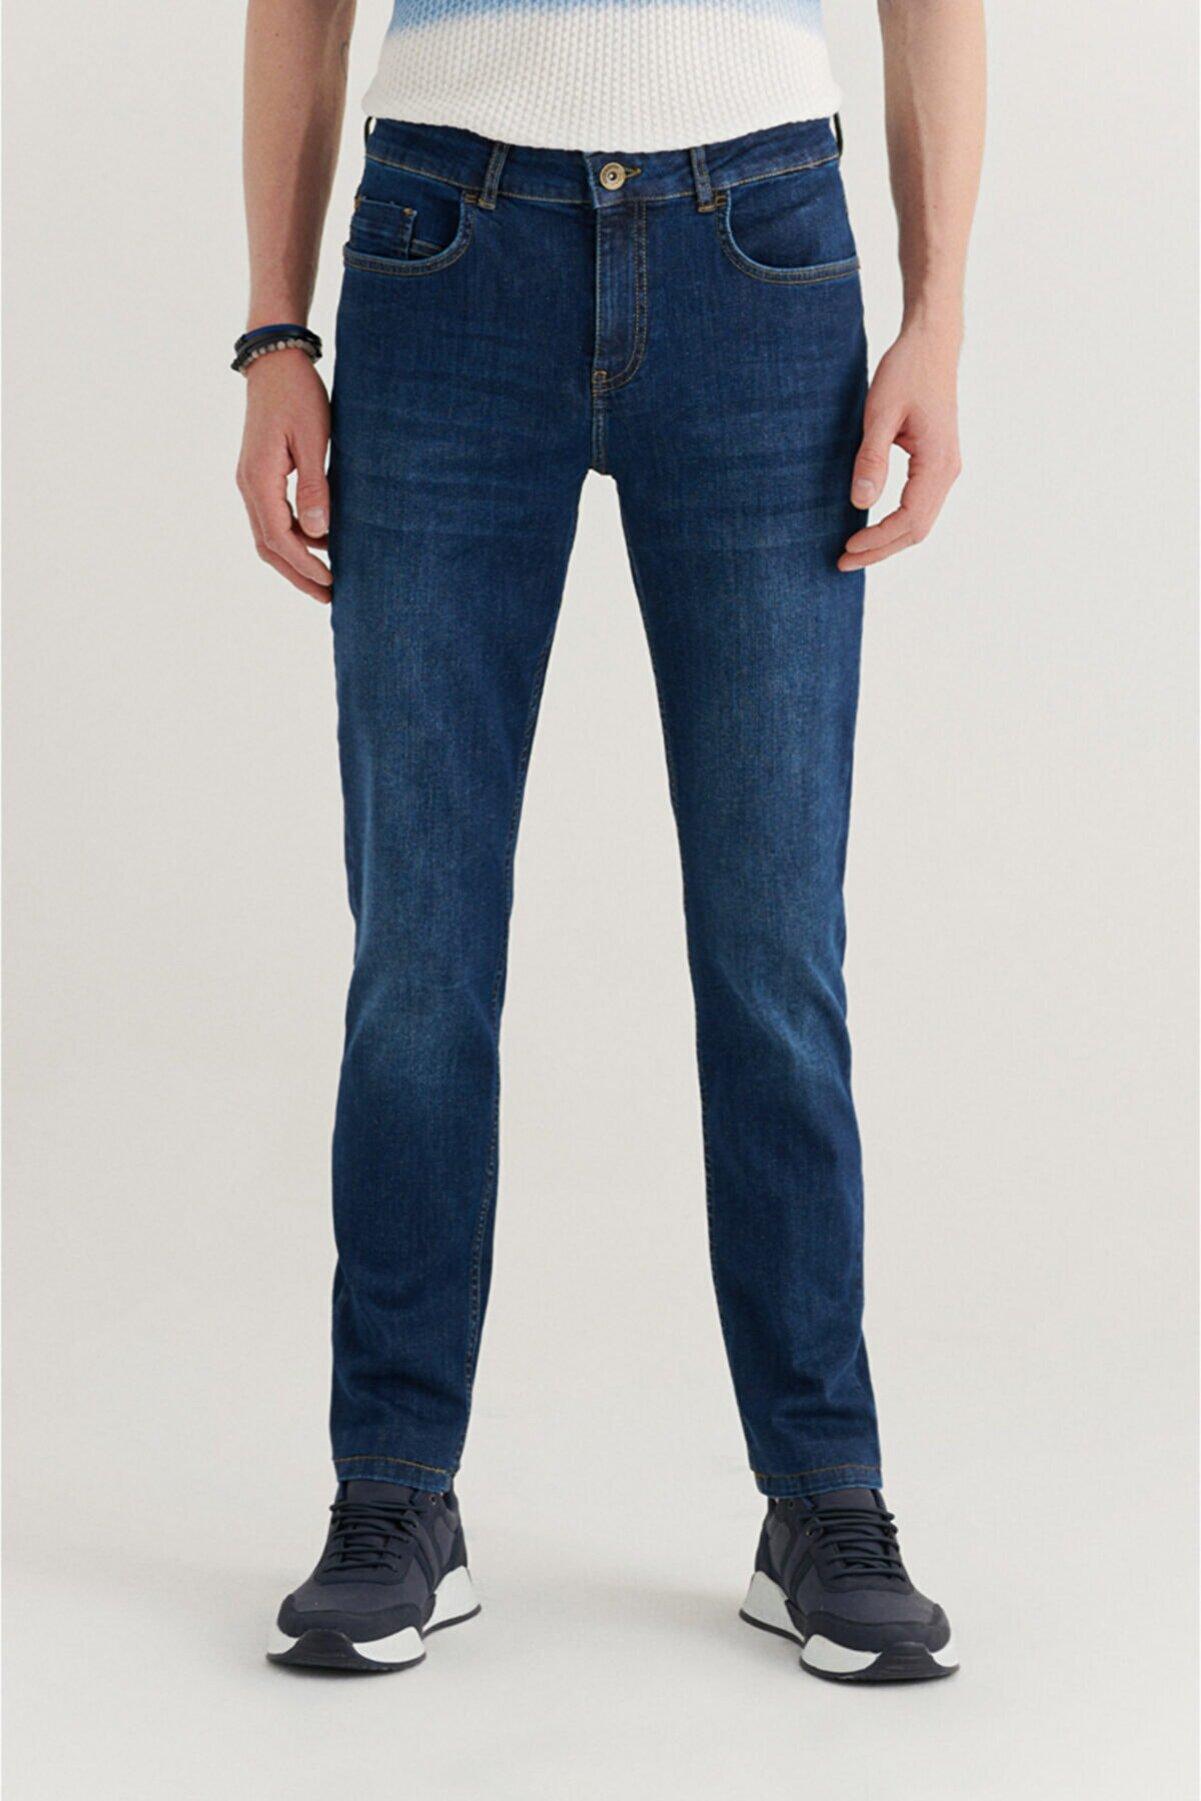 Avva Erkek Mavi Slim Fit Jean Pantolon A11y3528